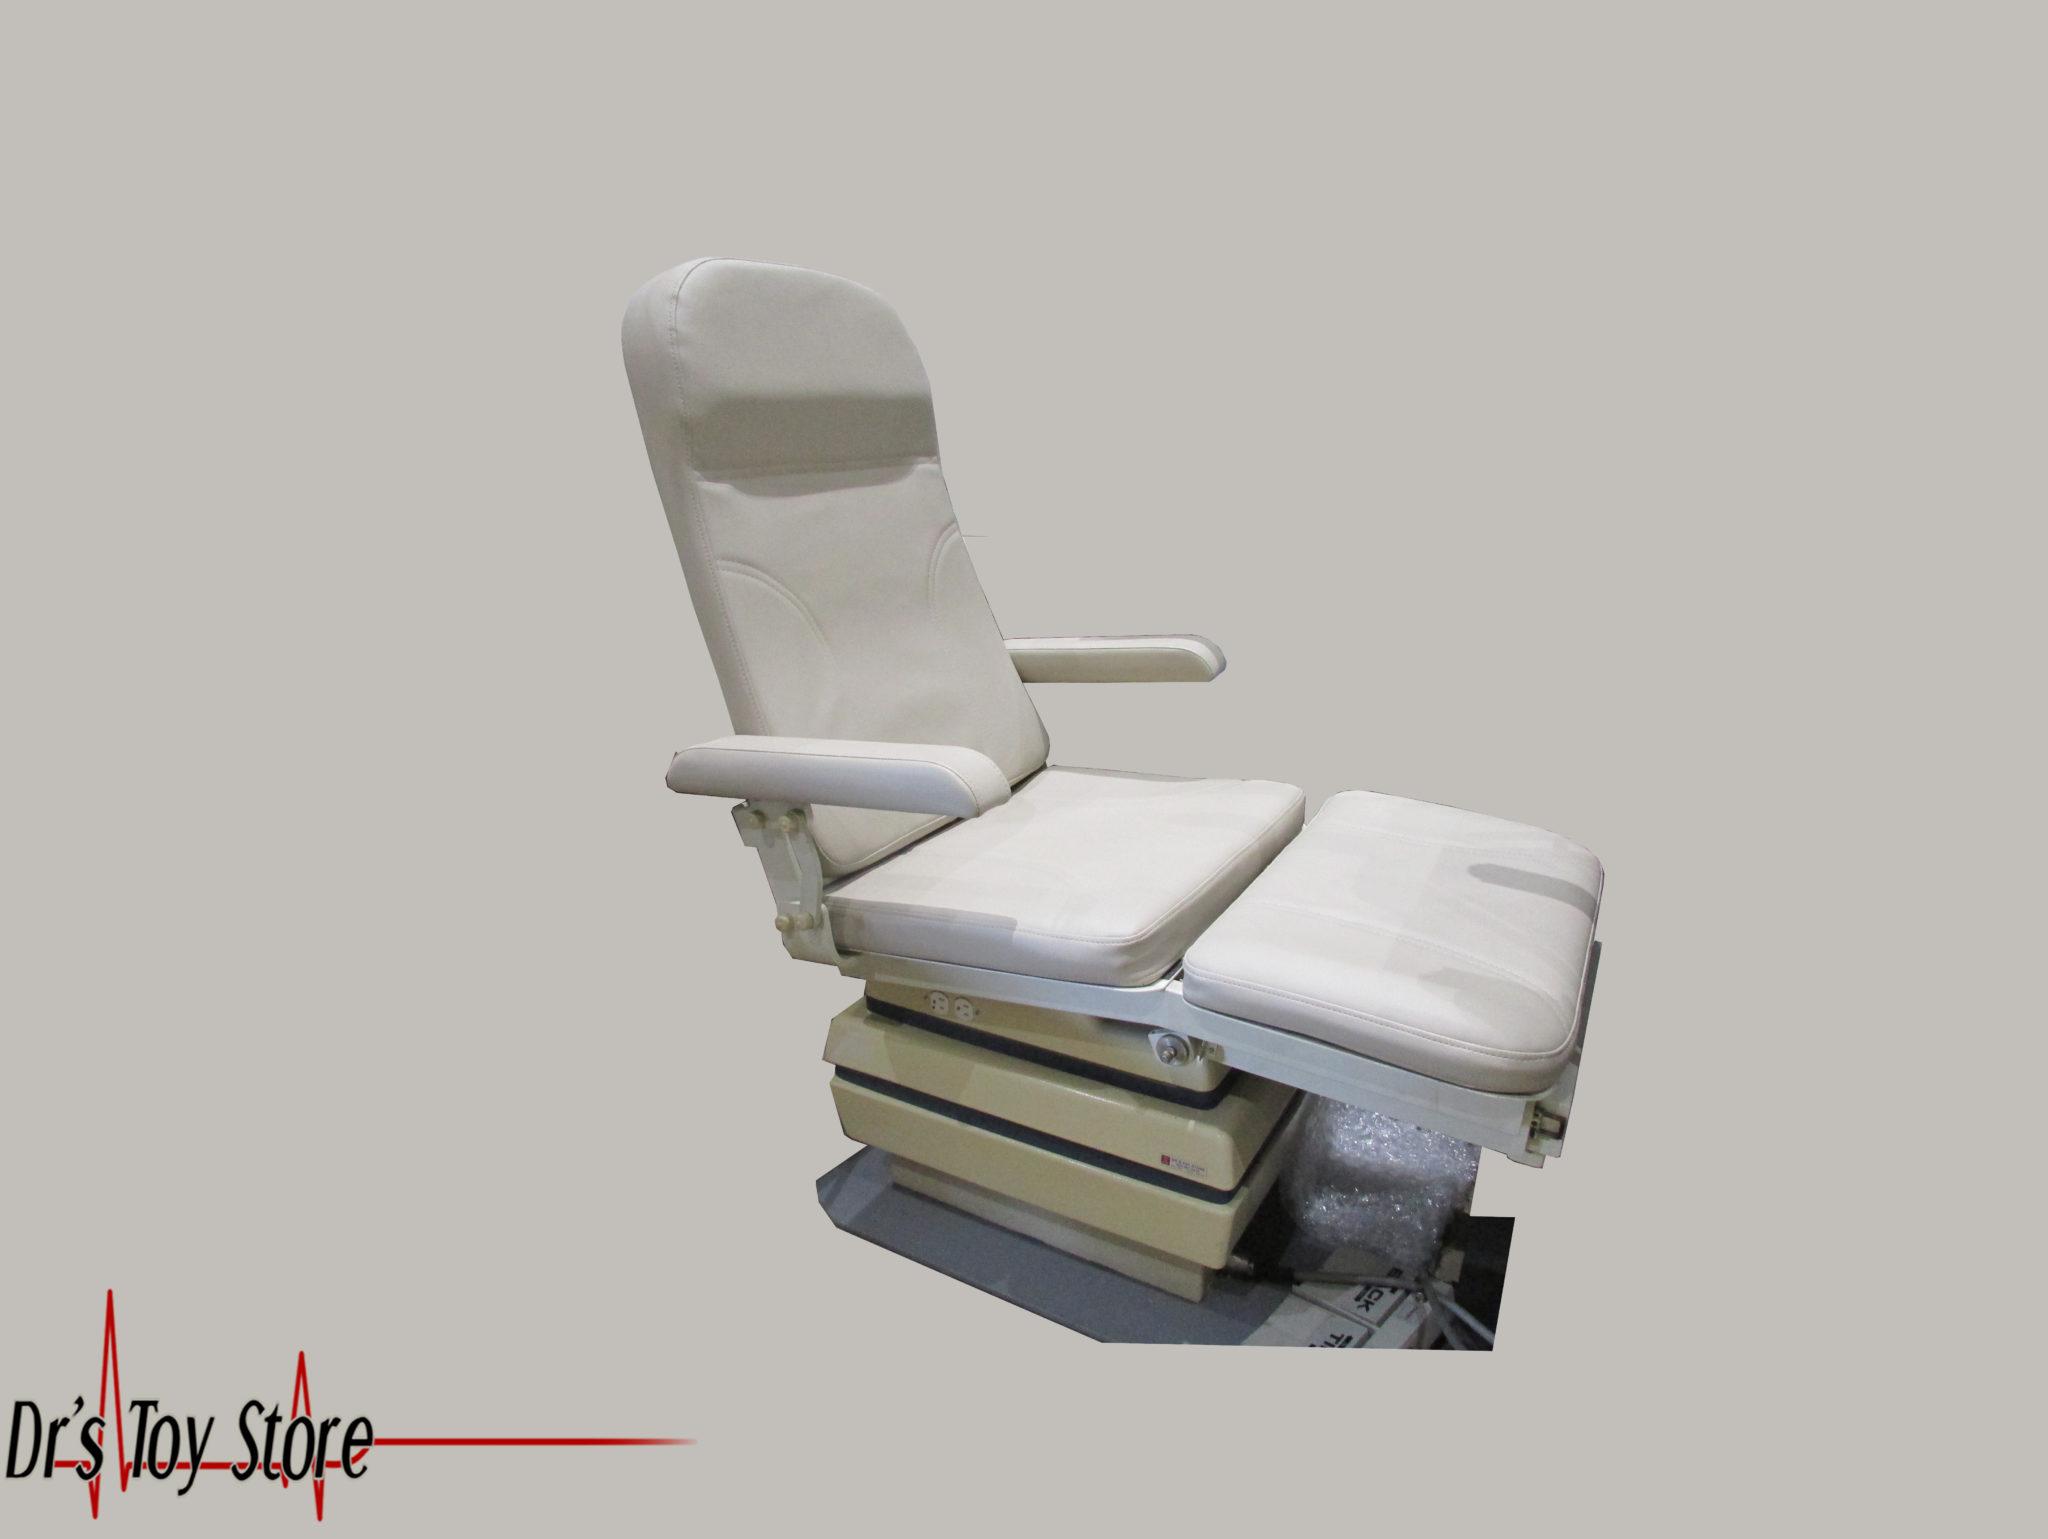 MTI Exam Power Chair